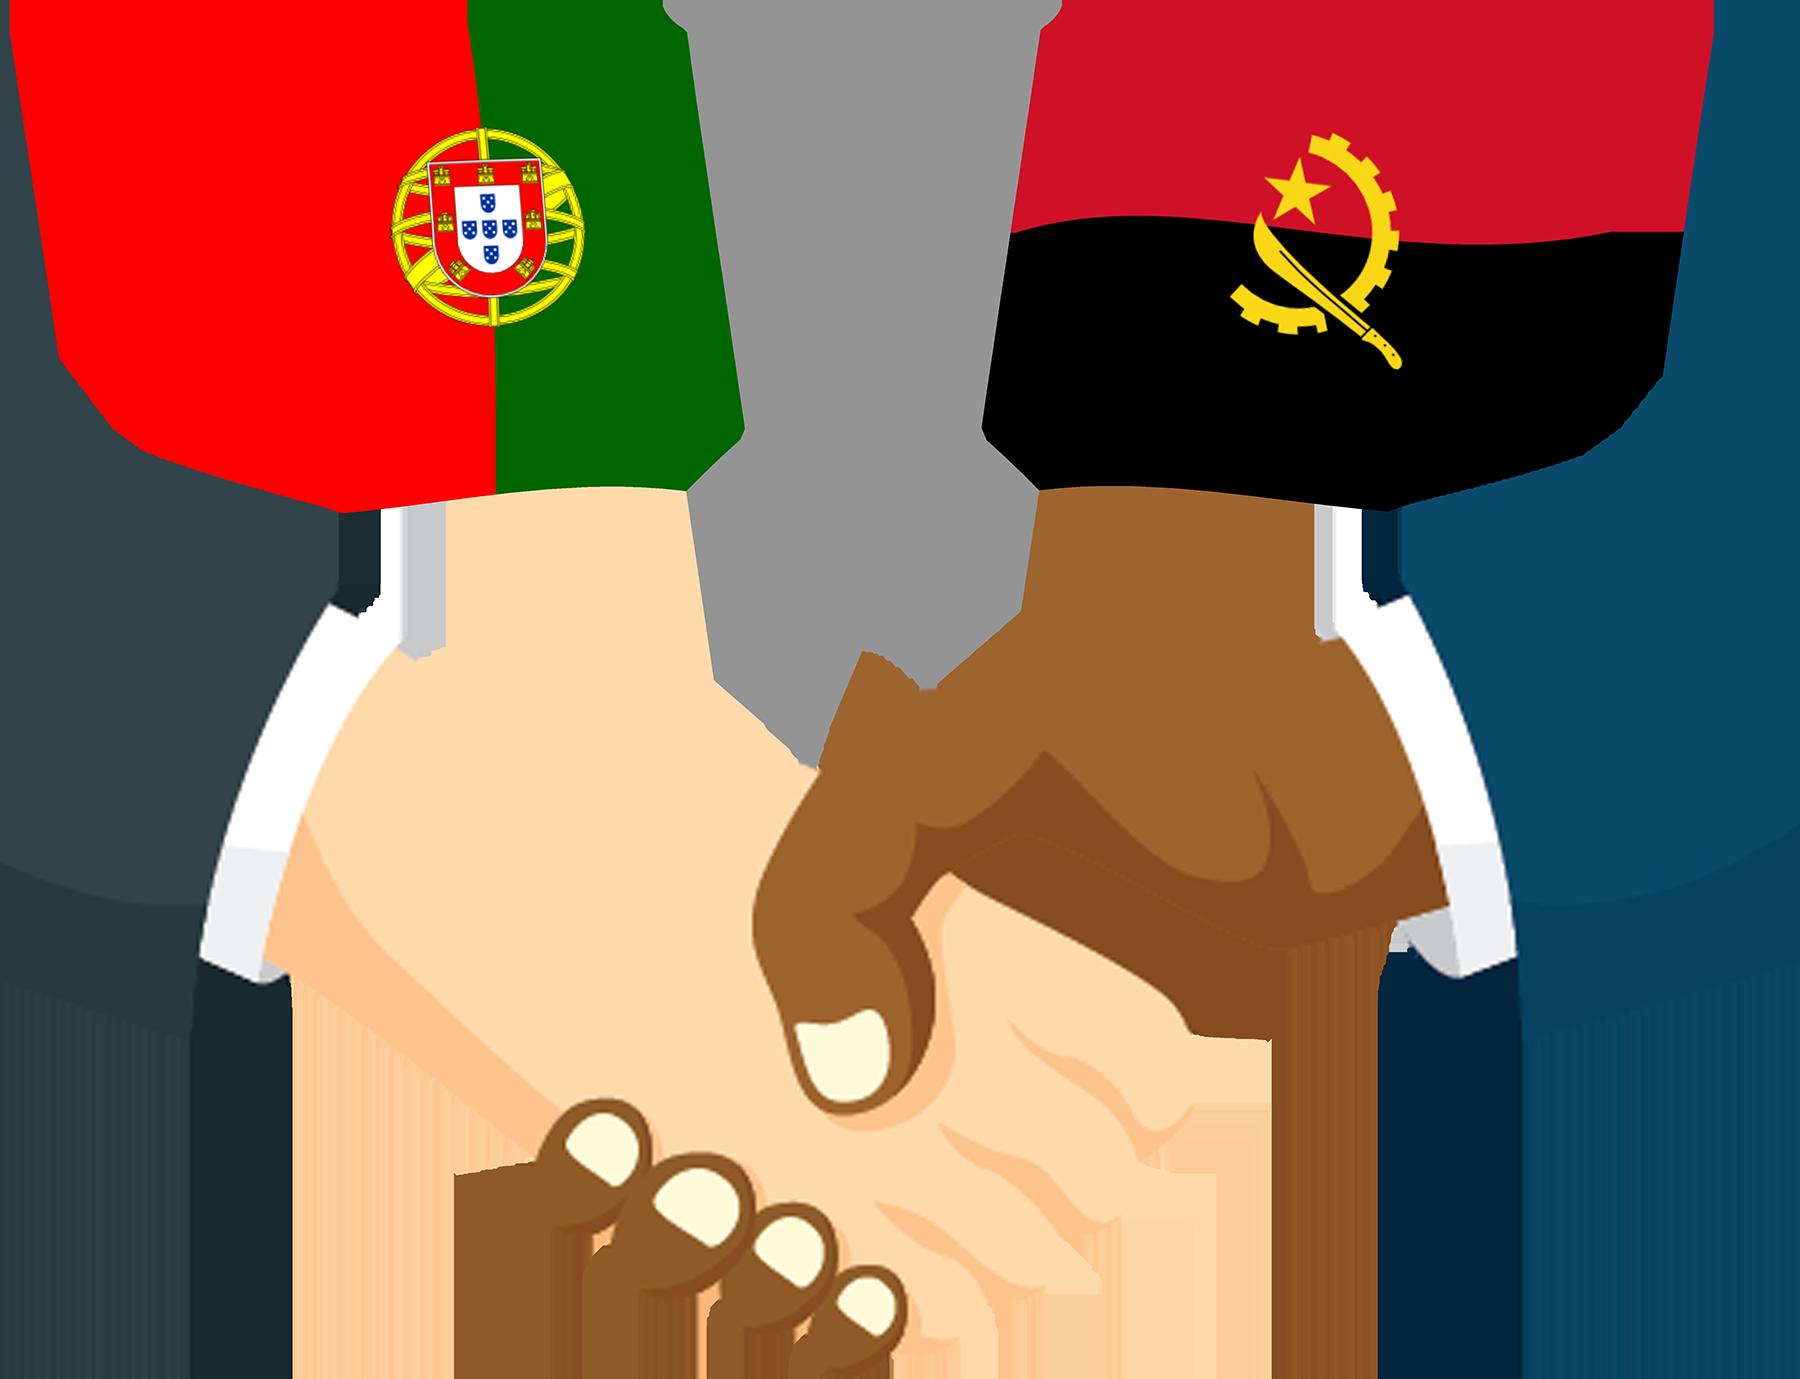 Collaboration clipart civil partnership. Sdsb farmac utica costumers